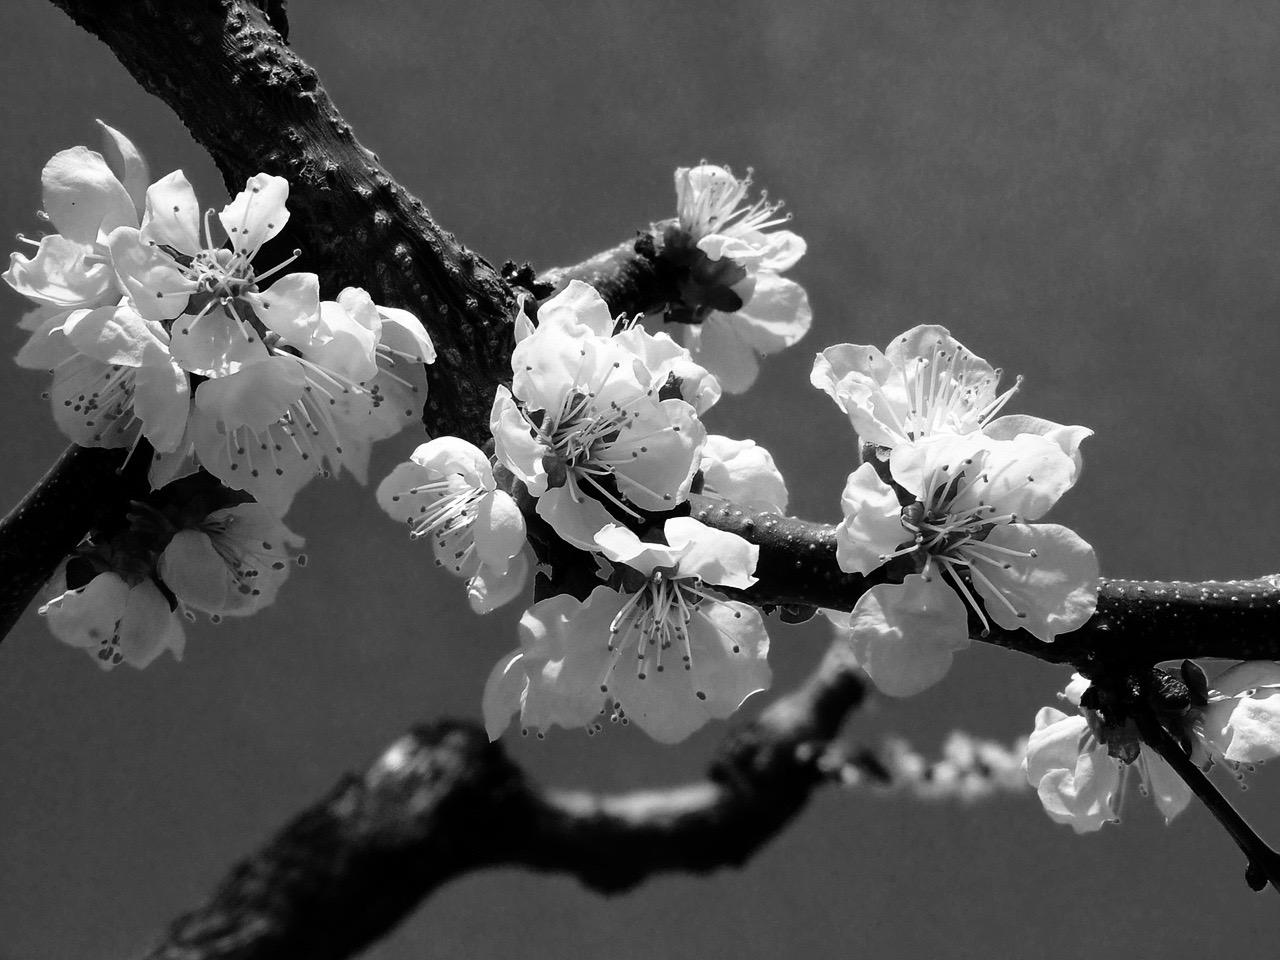 blossoms-1-1358608-1280x960